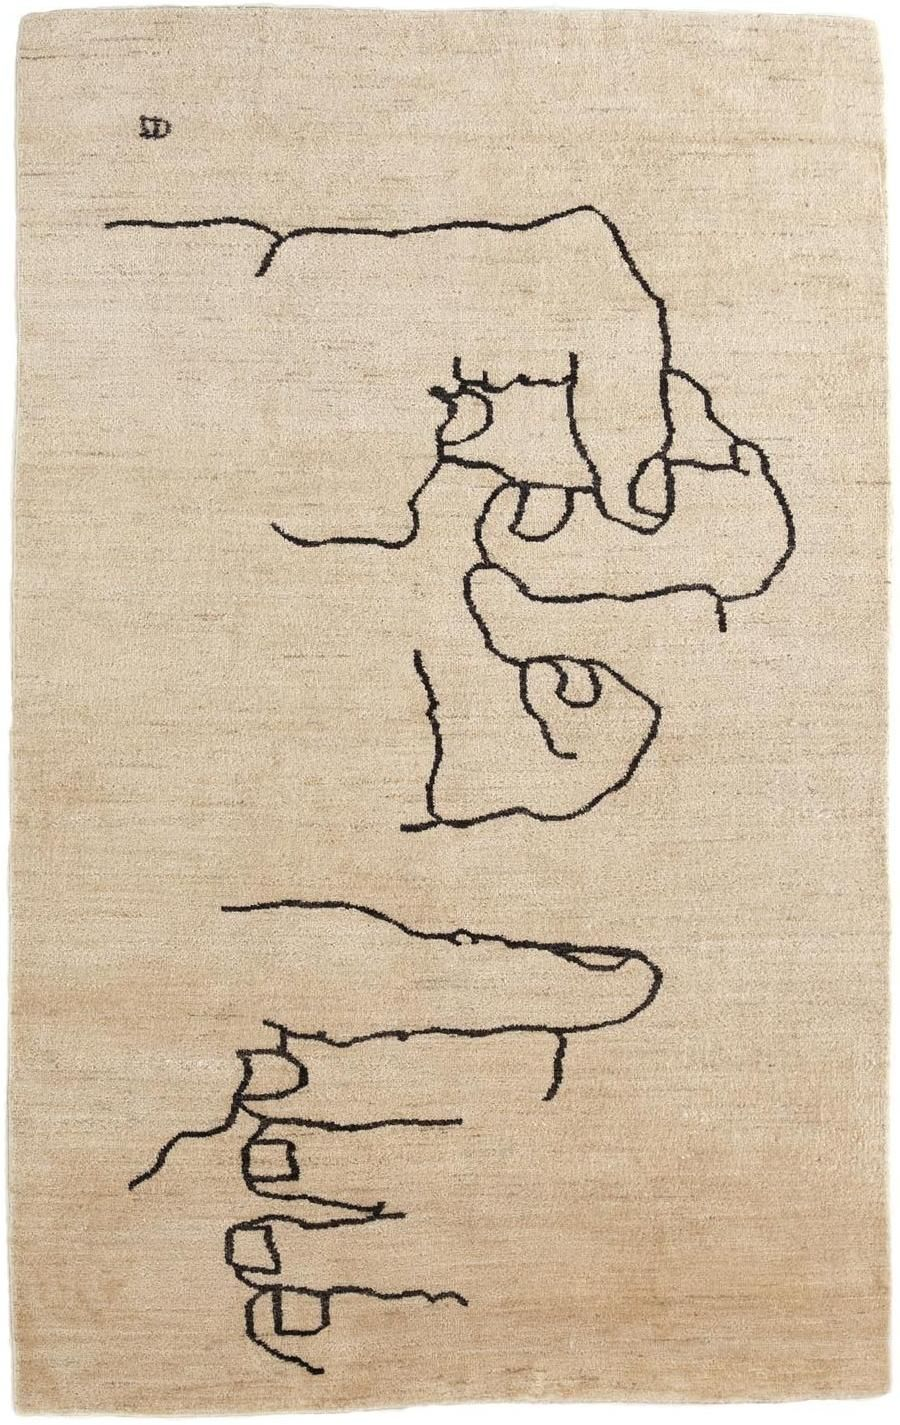 Manos 1995 by Eduardo Chillida; Nanimarquina's wool rug 6x9 $7293 . http://nanimarquina.com/design-rug/manos-1995/170:275::/ . http://www.2modern.com/products/chillida-manos-1995-rug